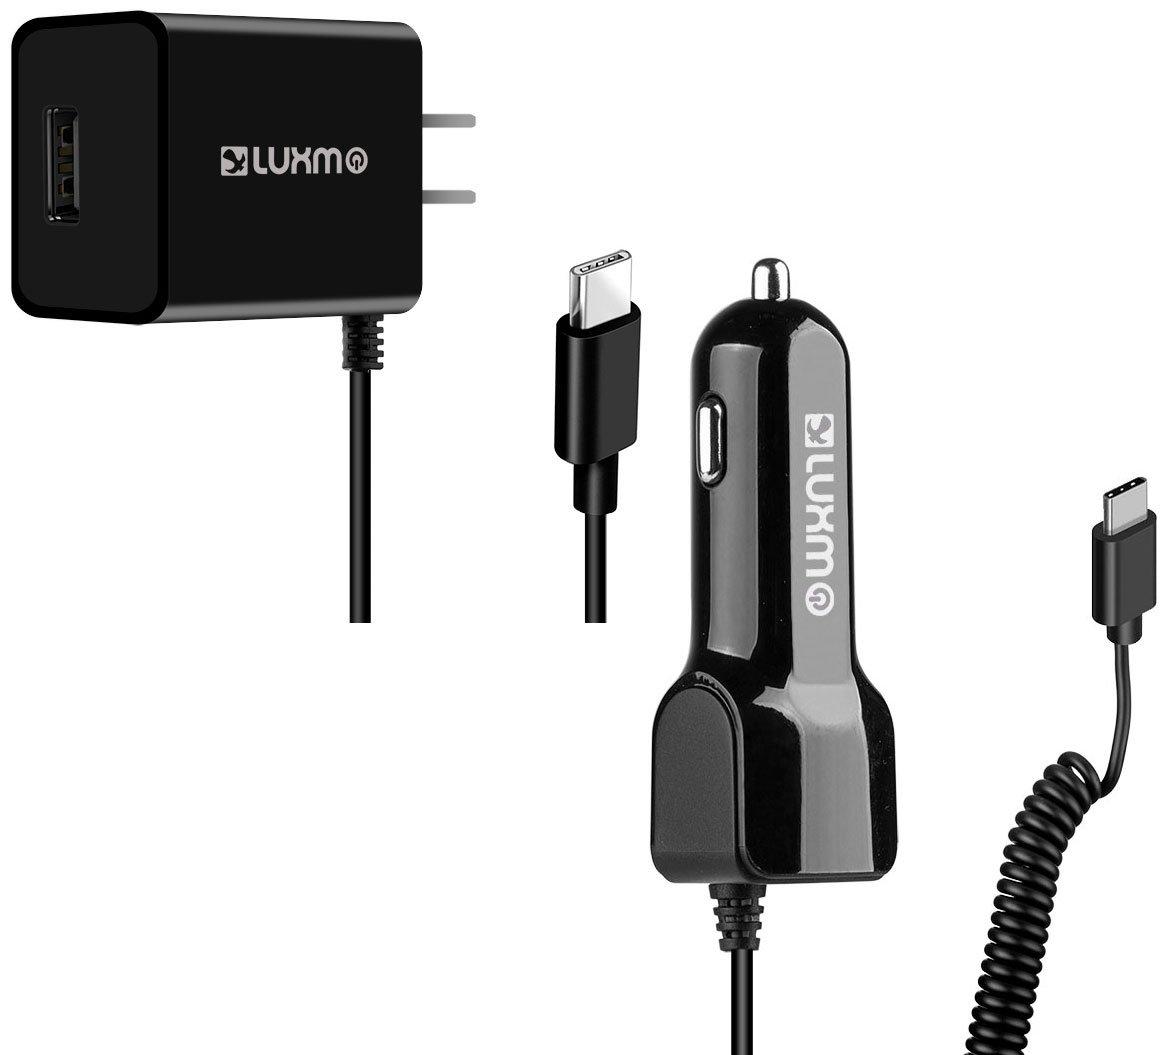 LG v20 USB C高電源車とホーム充電器パックwith Extra USBポートブラック B0799172F2